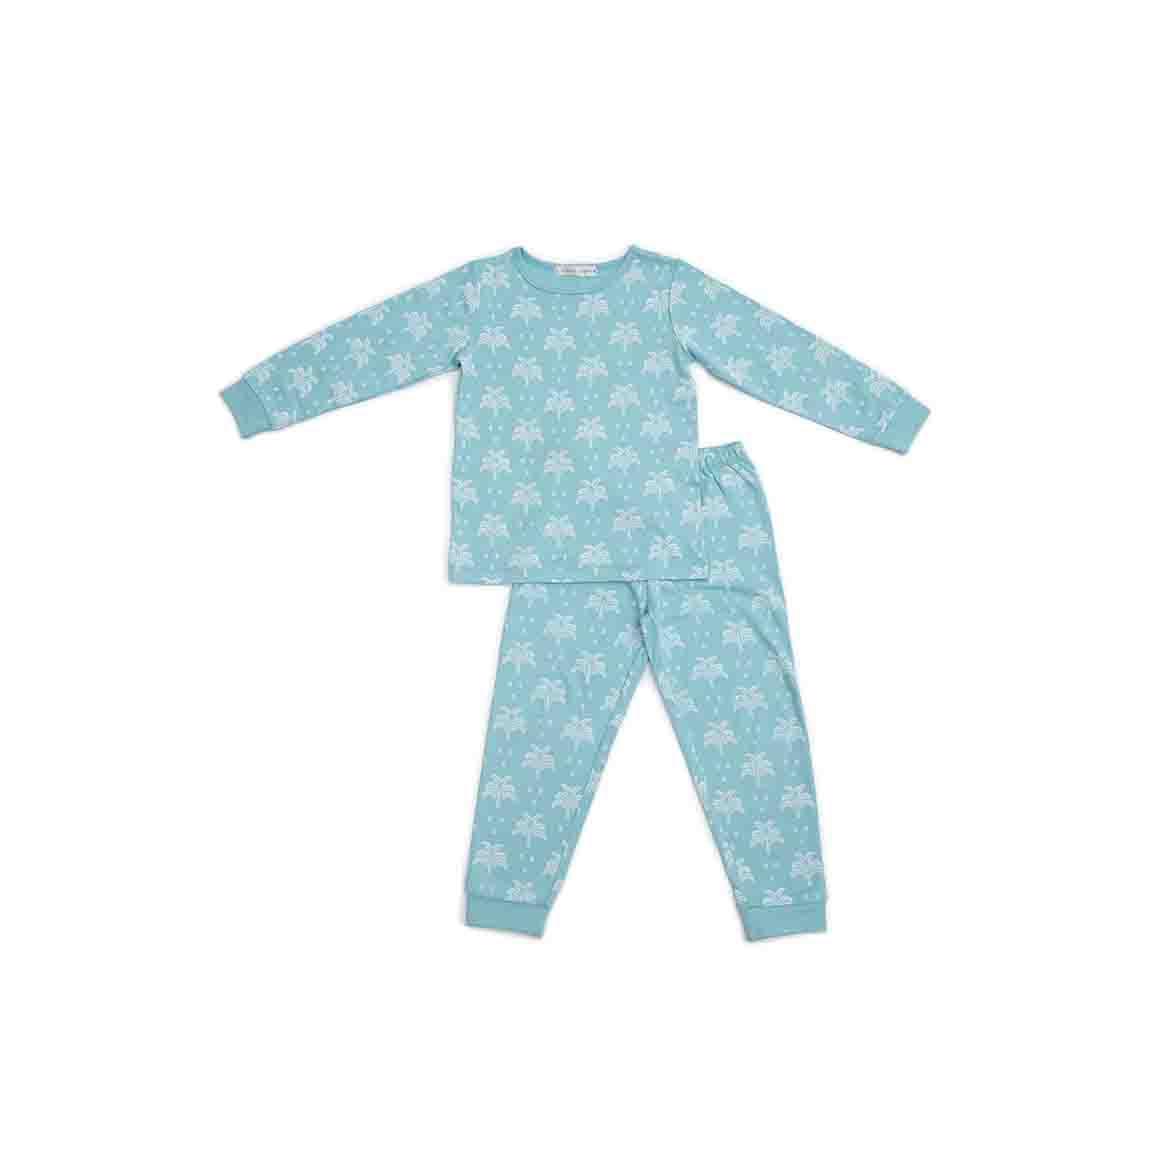 Autumn/Winter Childrens Pyjama Set - Aquatic Blue in Palms and Pineapple Print   Trada Marketplace